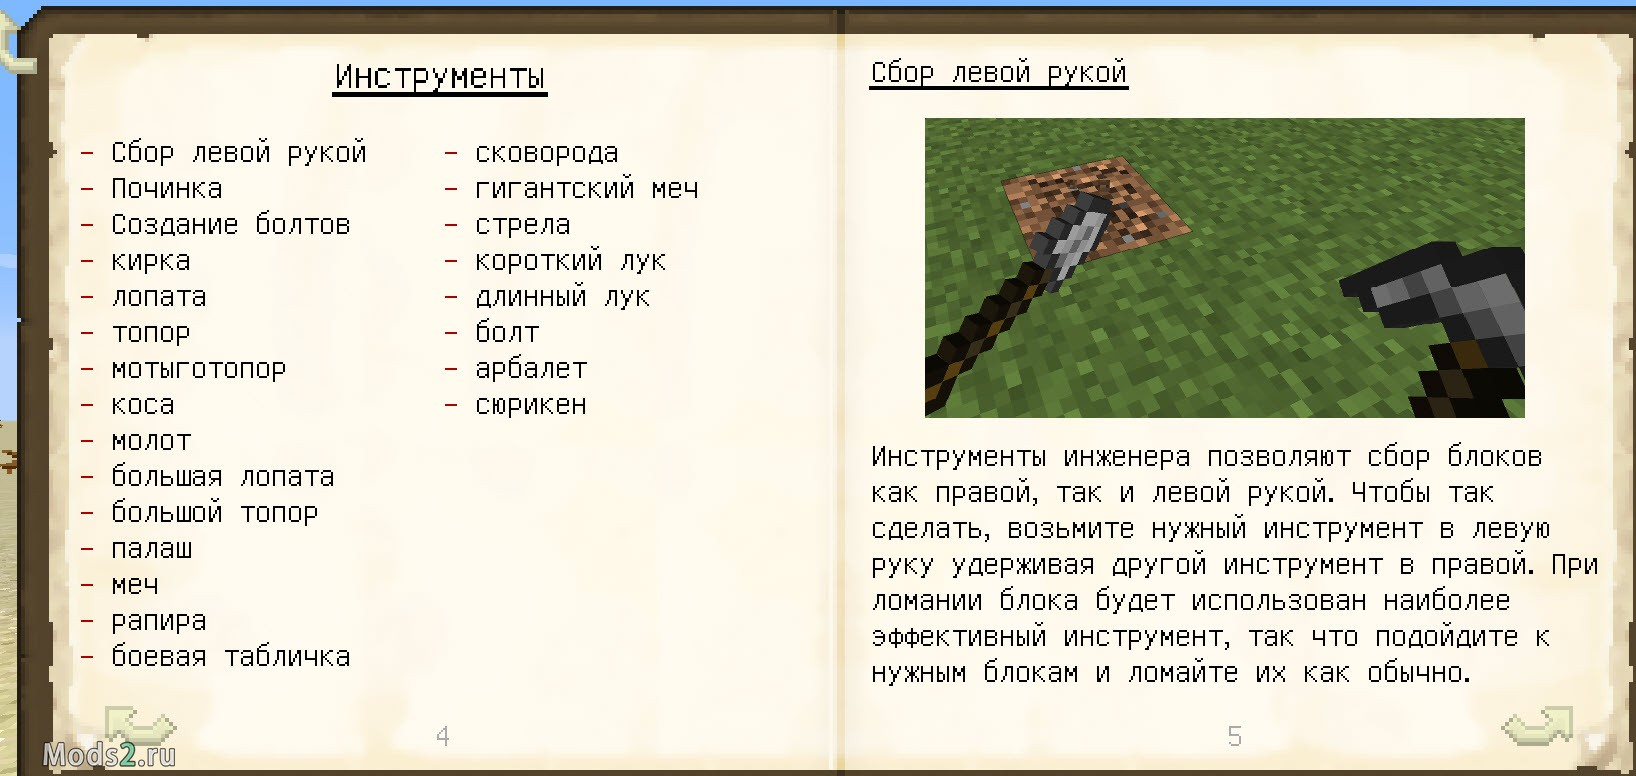 Мод на сумеречный лес для майнкрафт 1. 12. 2 1. 11. 2 1. 11 1. 11 1. 8. 9.